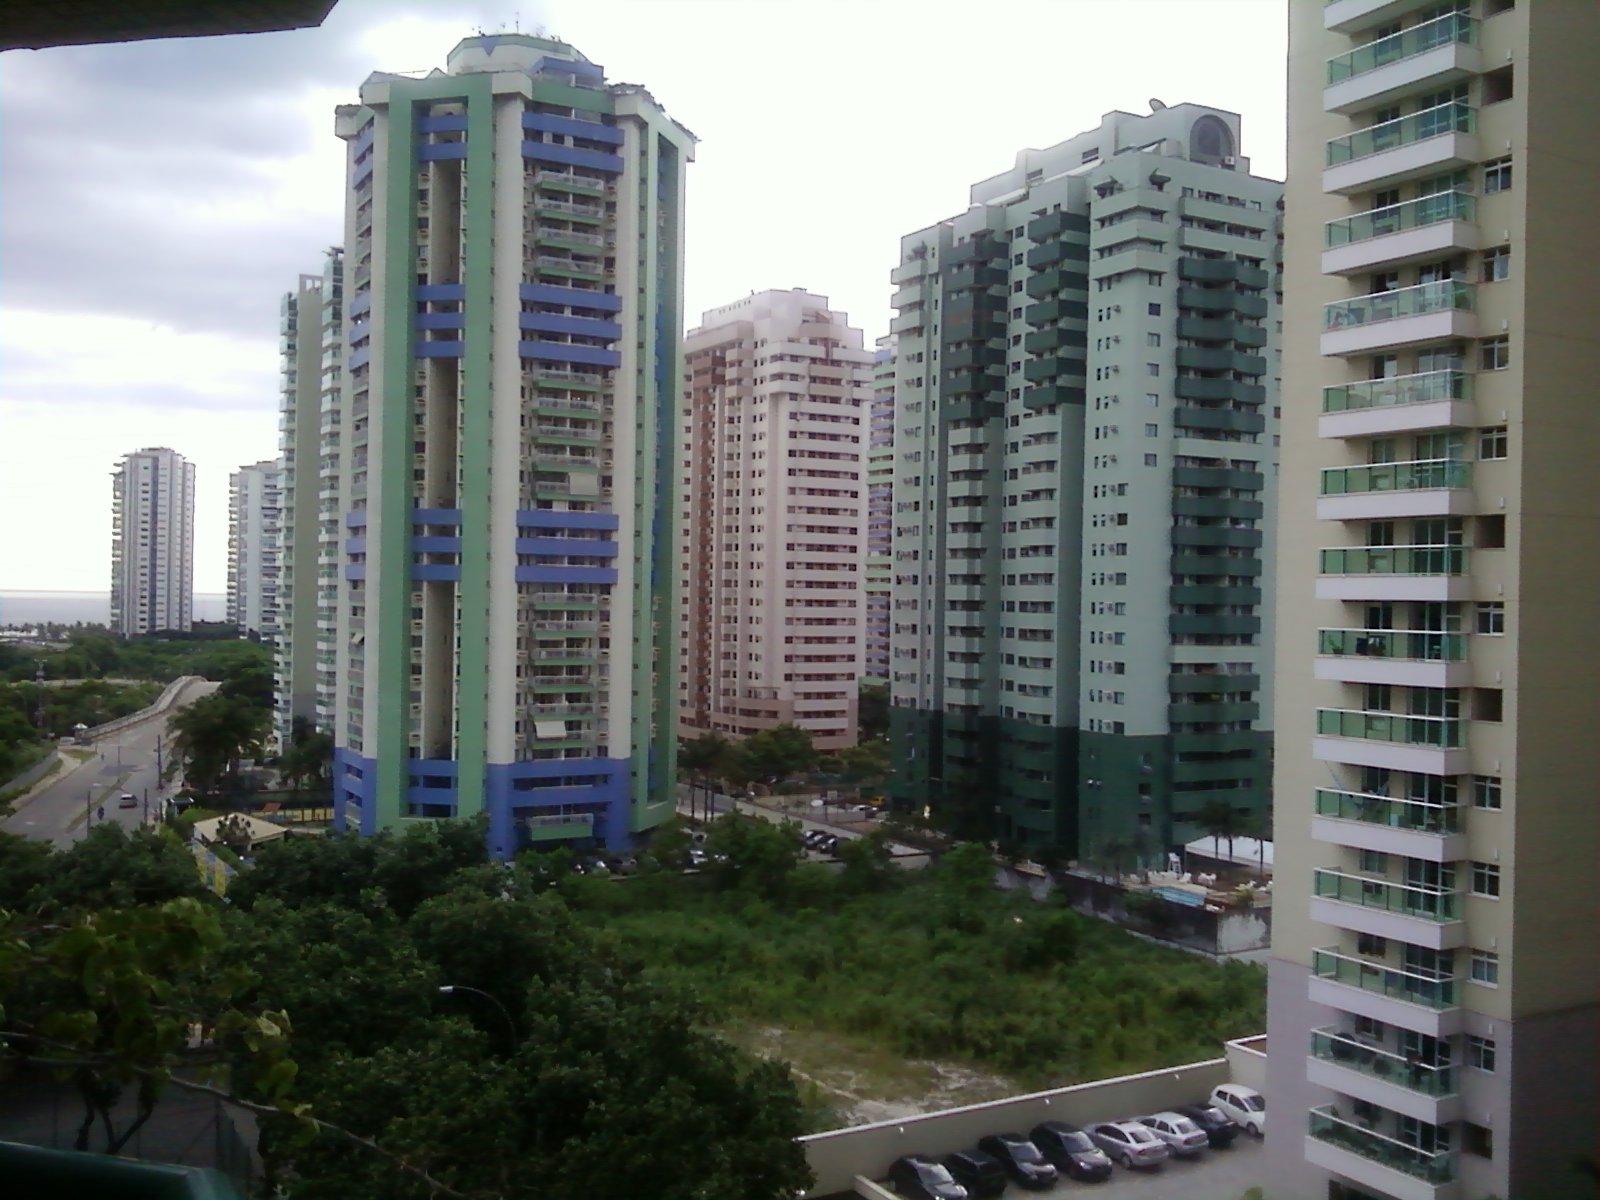 Housing In Latin America Brazil Mexico Argentina Etc